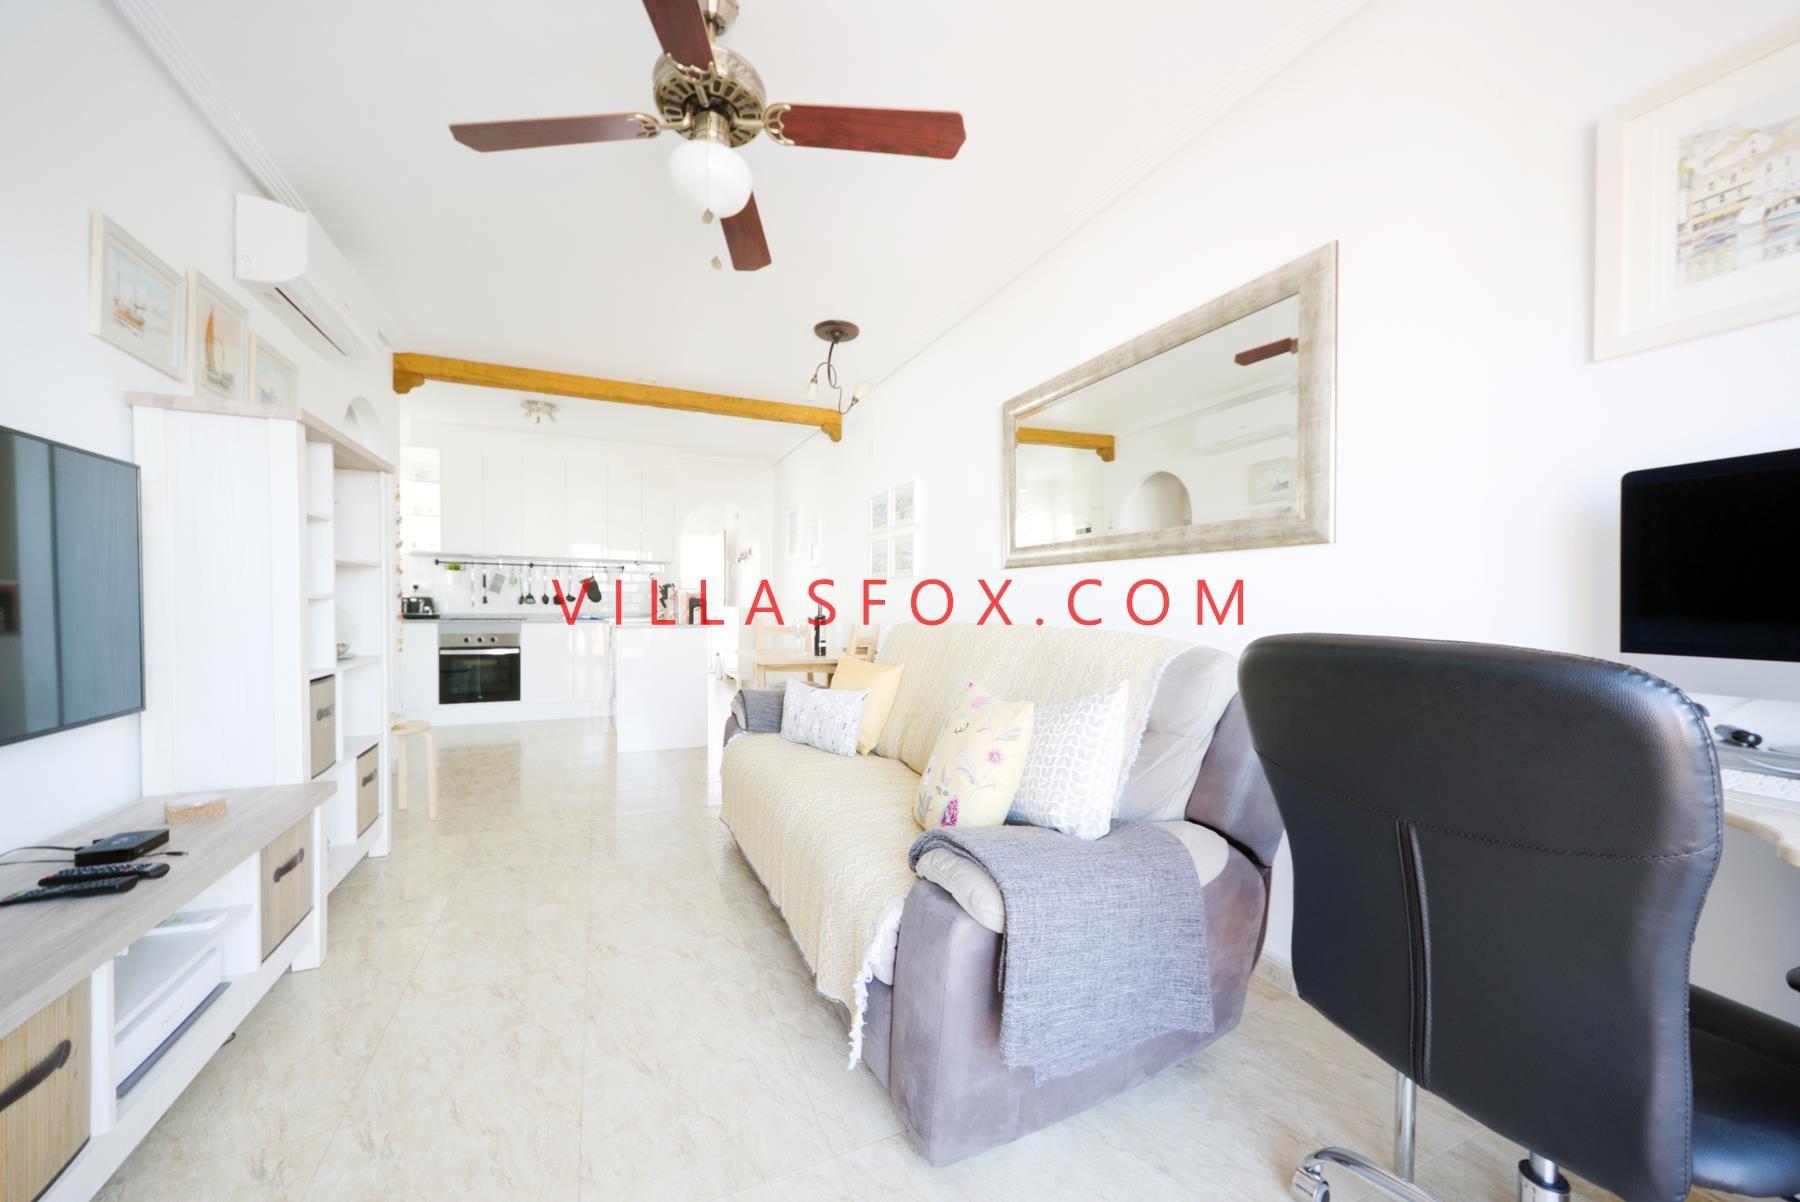 2-bedroom top-floor apartment with private solarium and garage, San